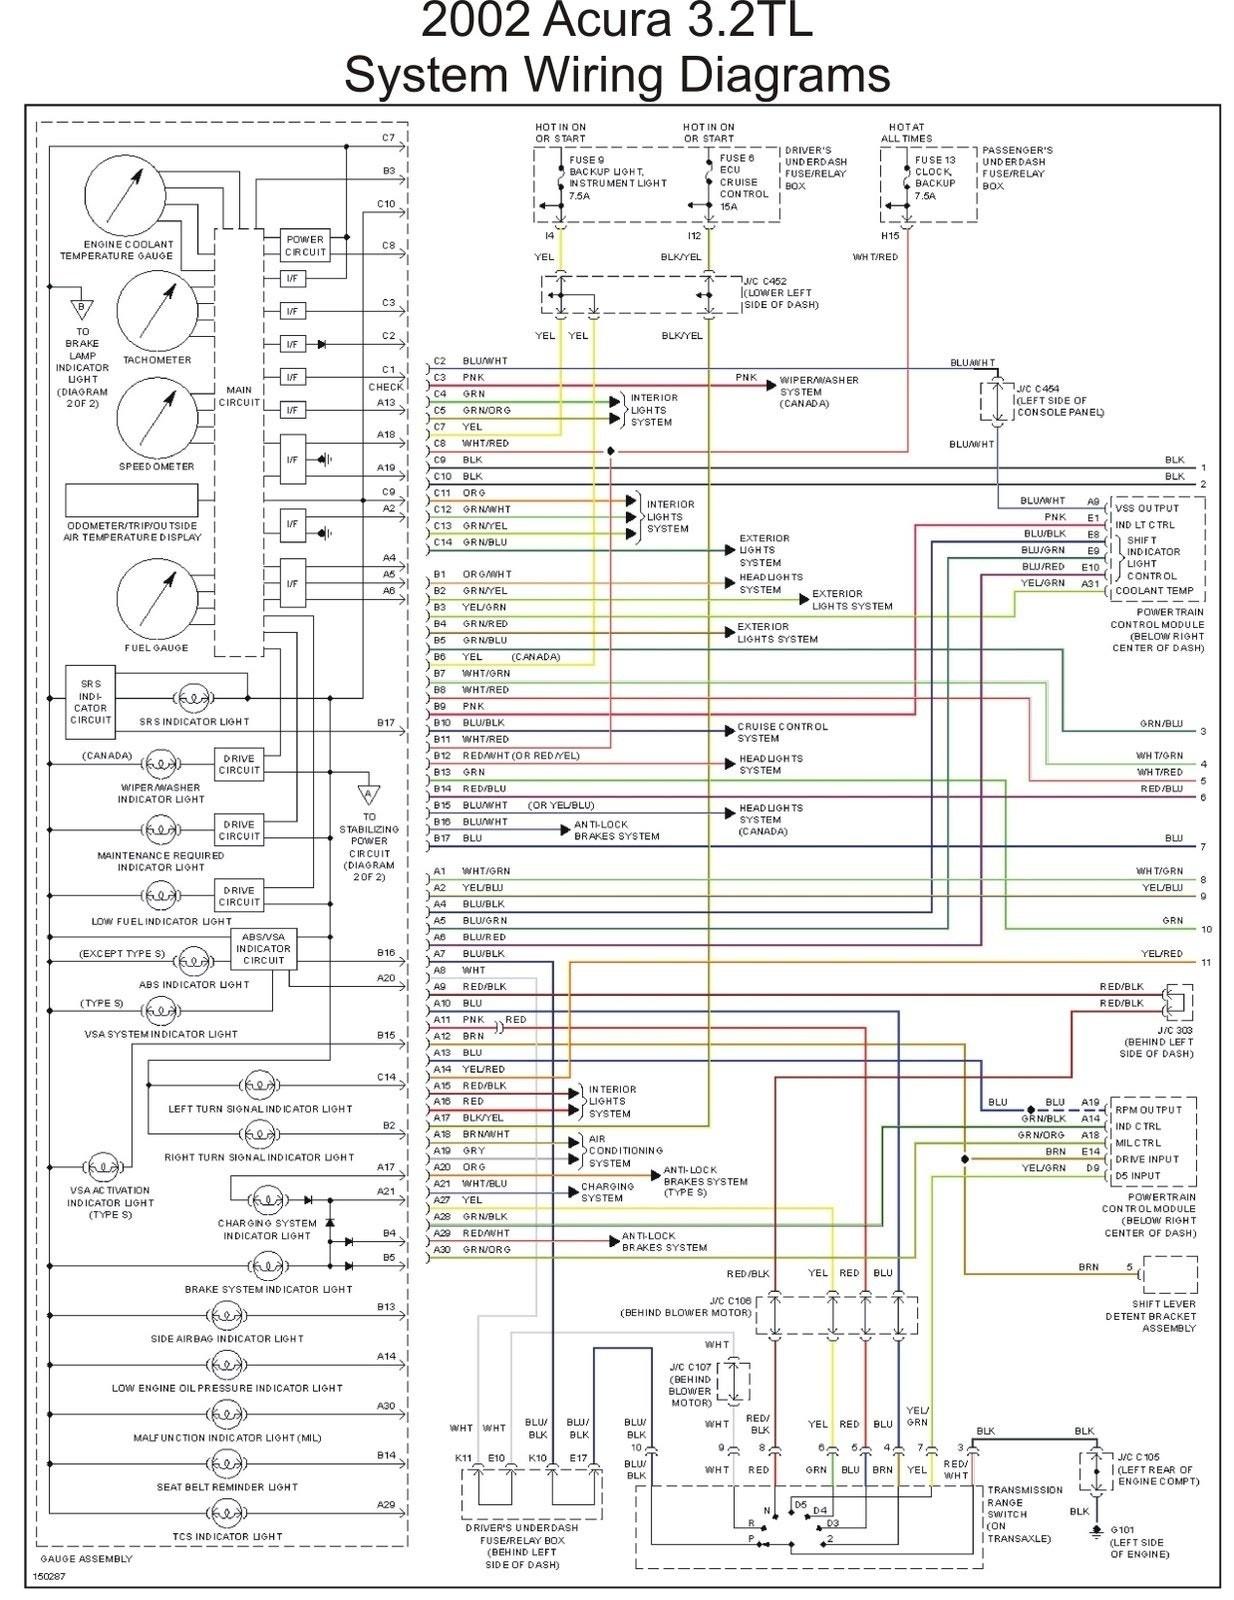 2002 Honda Civic Engine Diagram Honda Civic Fuse Box Diagram Gmc Yukon Engine Bustion Chamber Of 2002 Honda Civic Engine Diagram